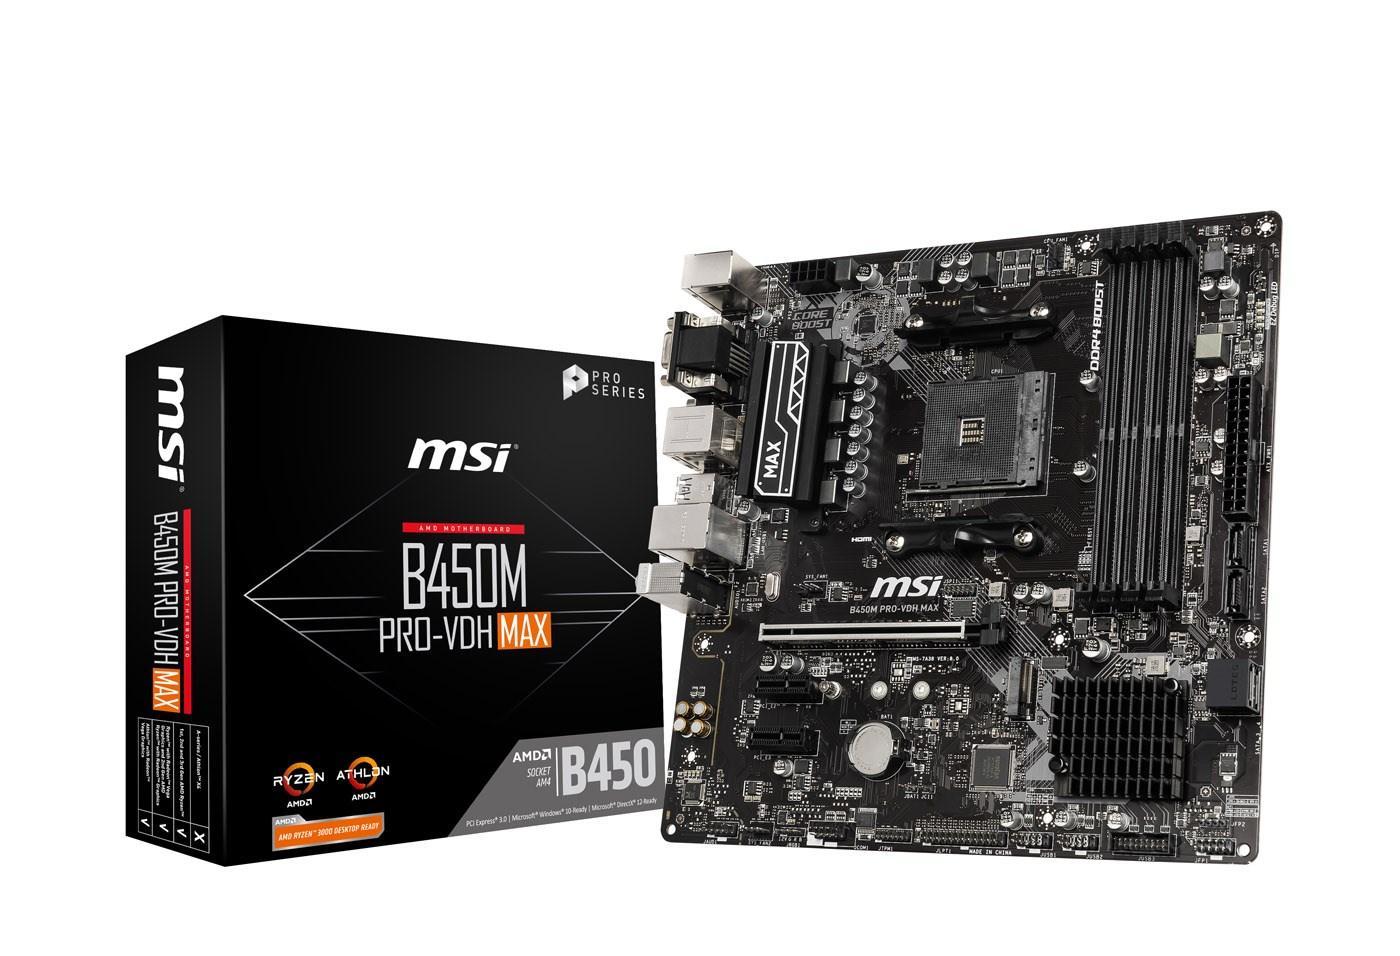 MSI B450M PRO-VDH Micro ATX AM4